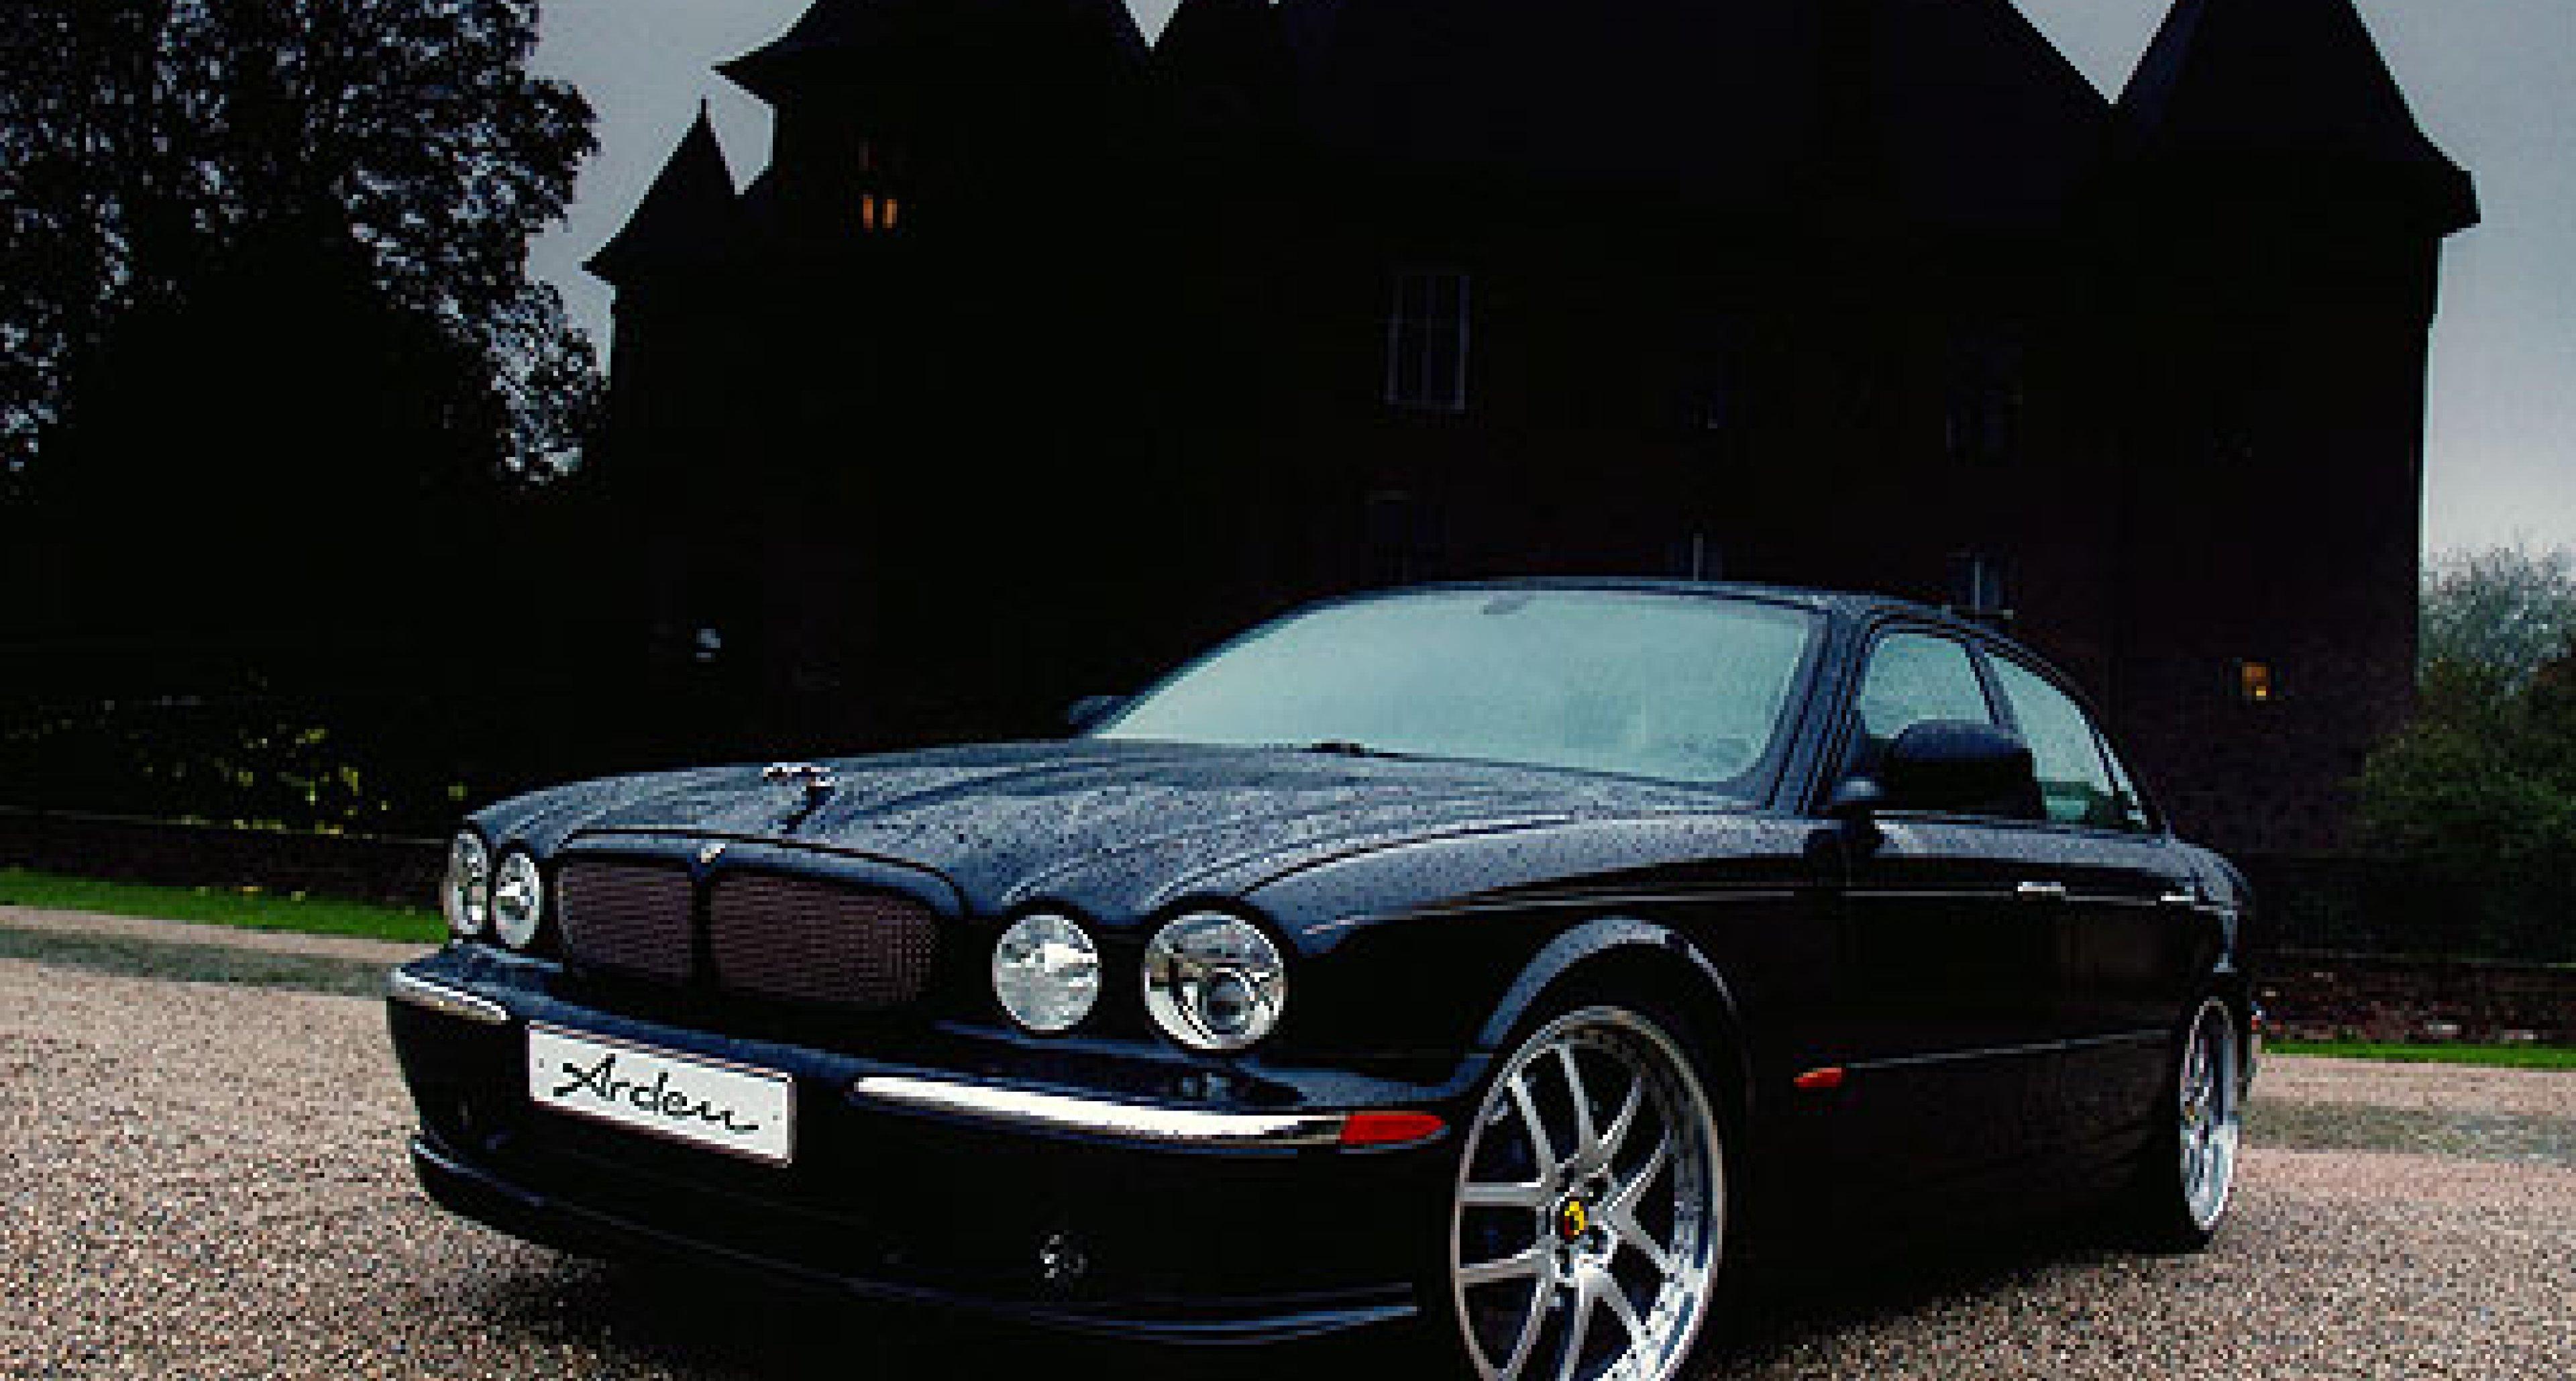 Arden stärkt den Jaguar XJ